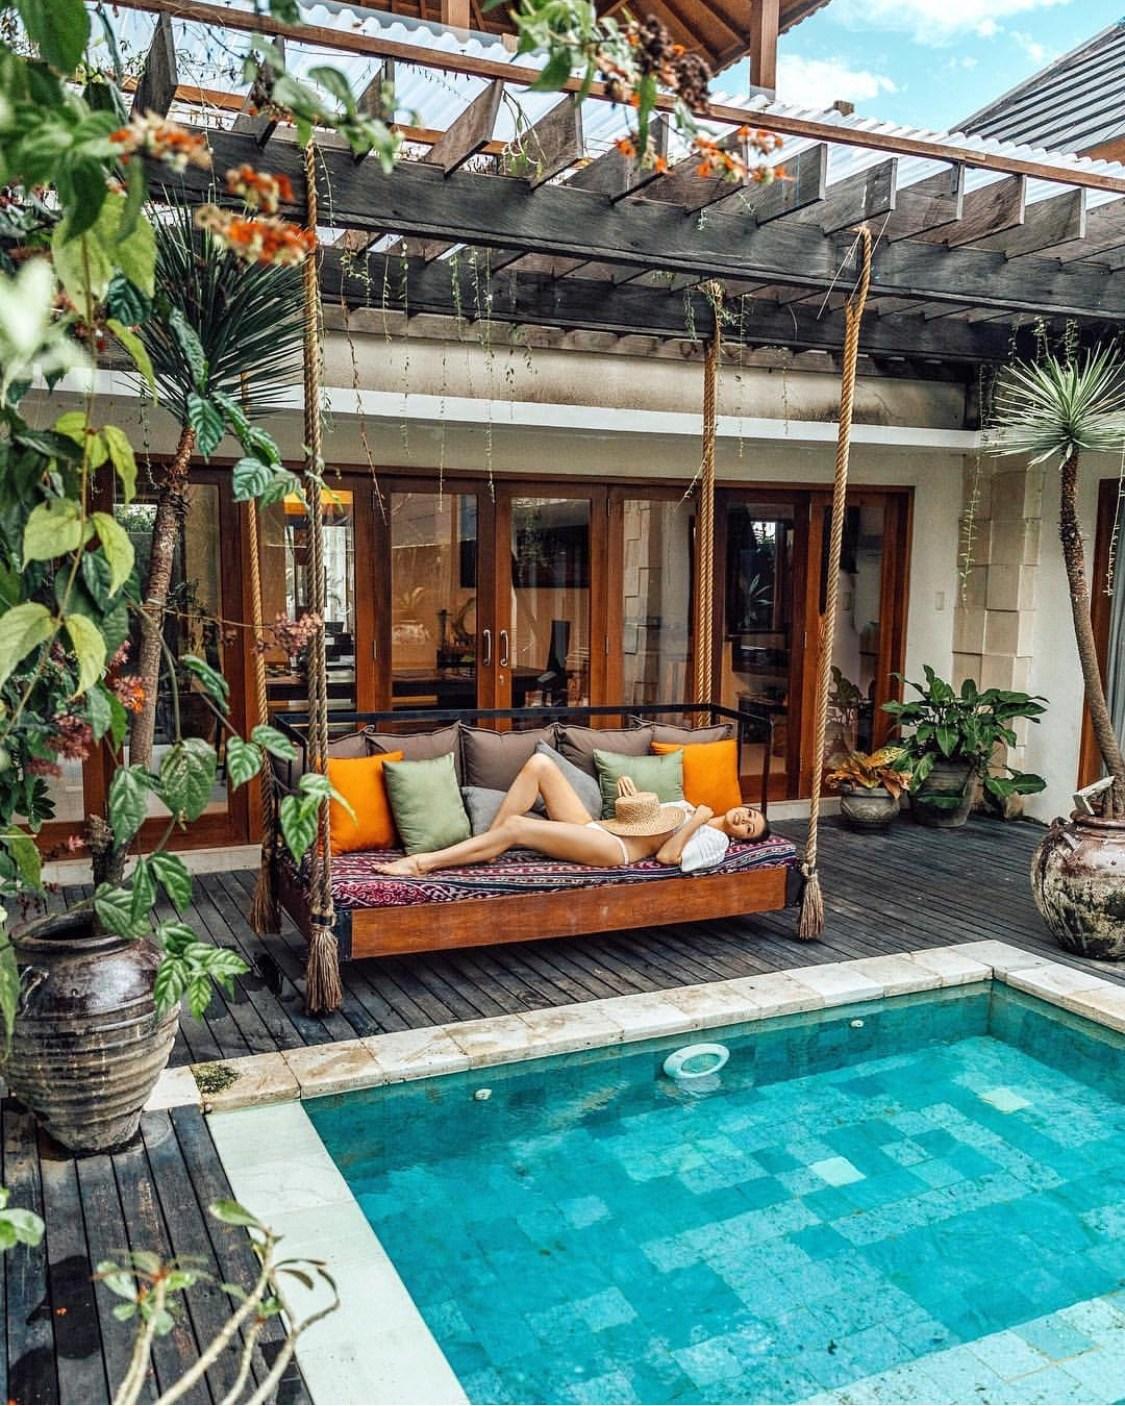 Swim Resort Bali - Villa Ariana Grande